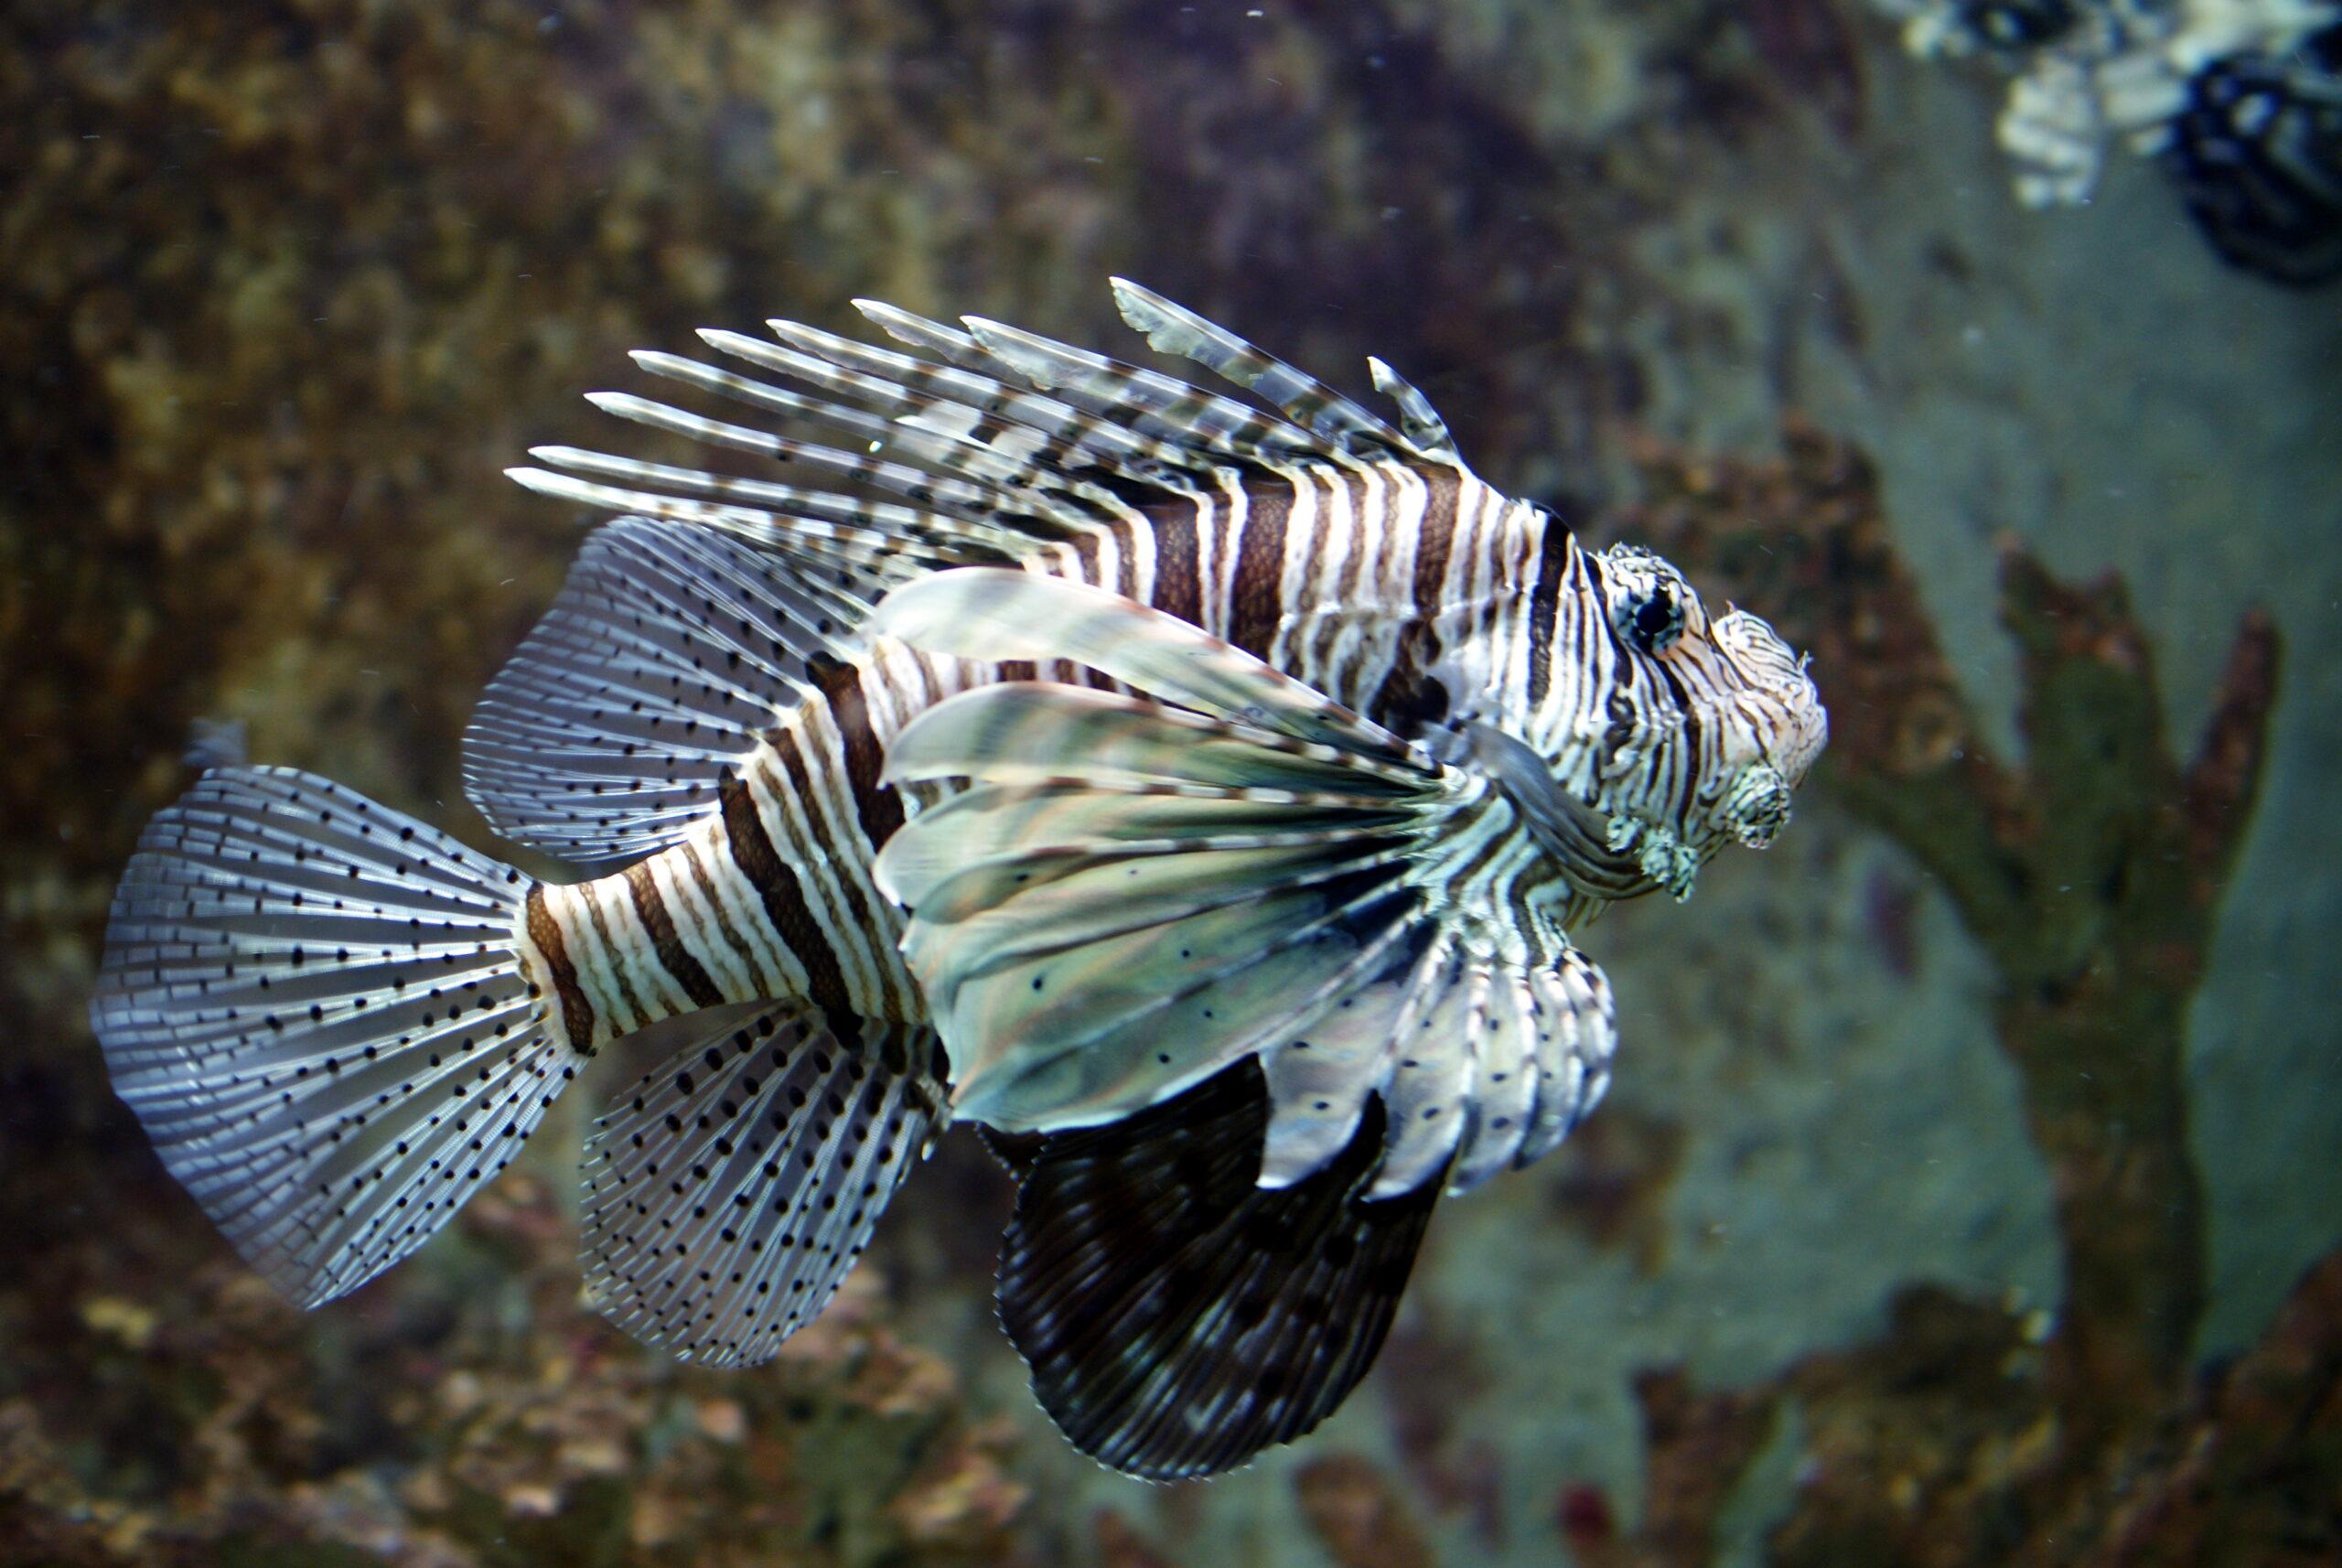 Peix escorpí   Wikimedia Commons